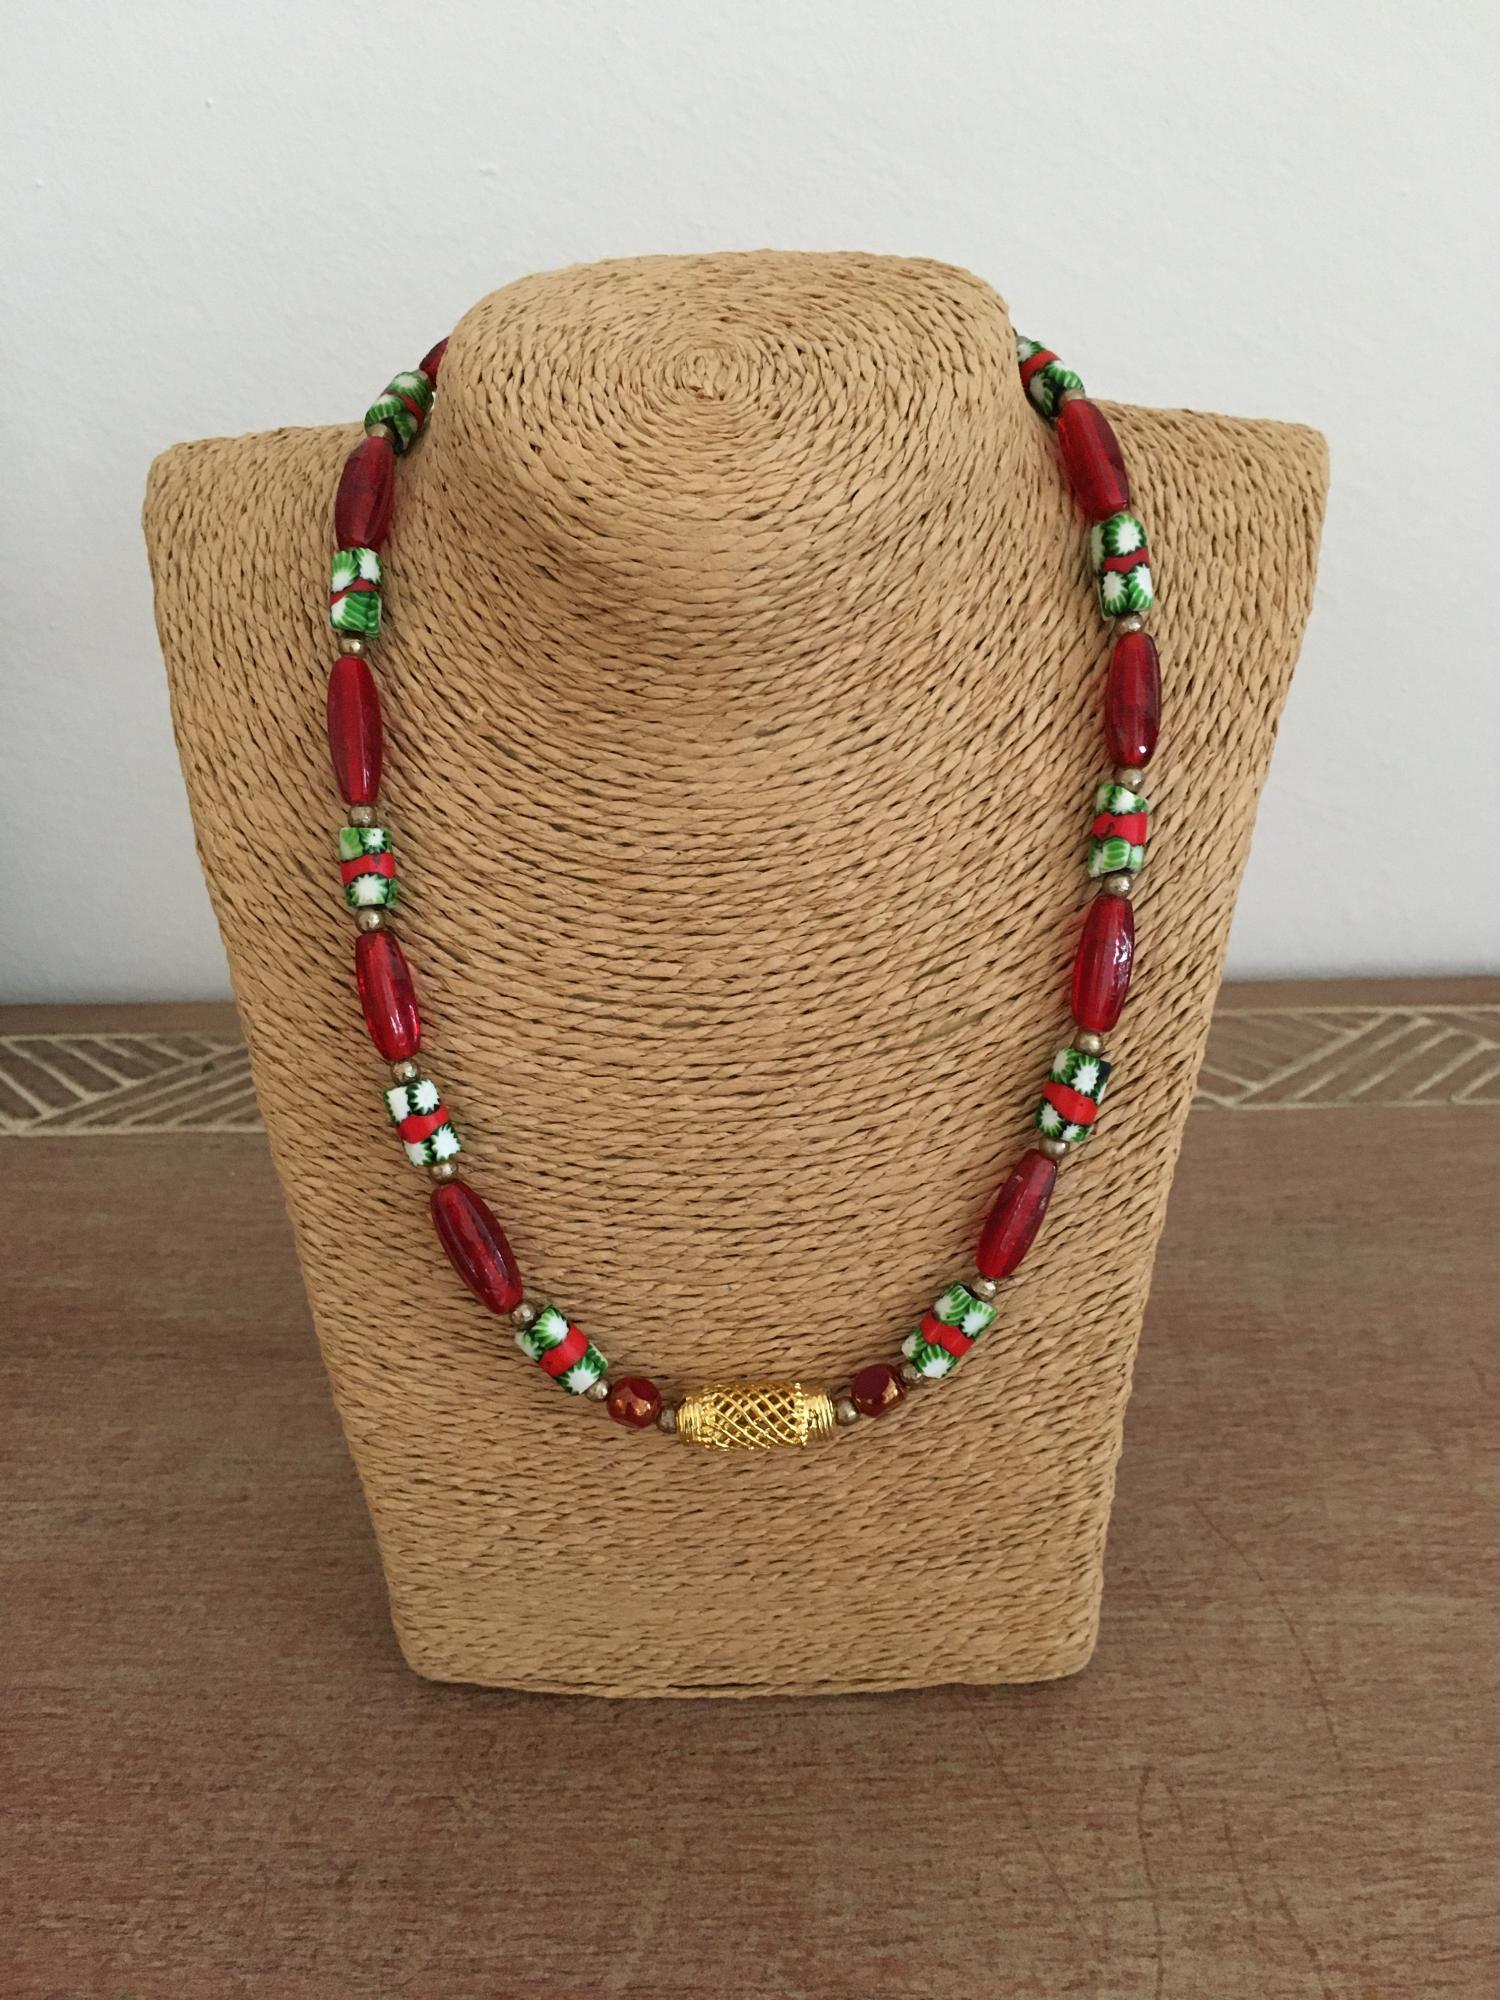 Trade Beads -African Beads Design